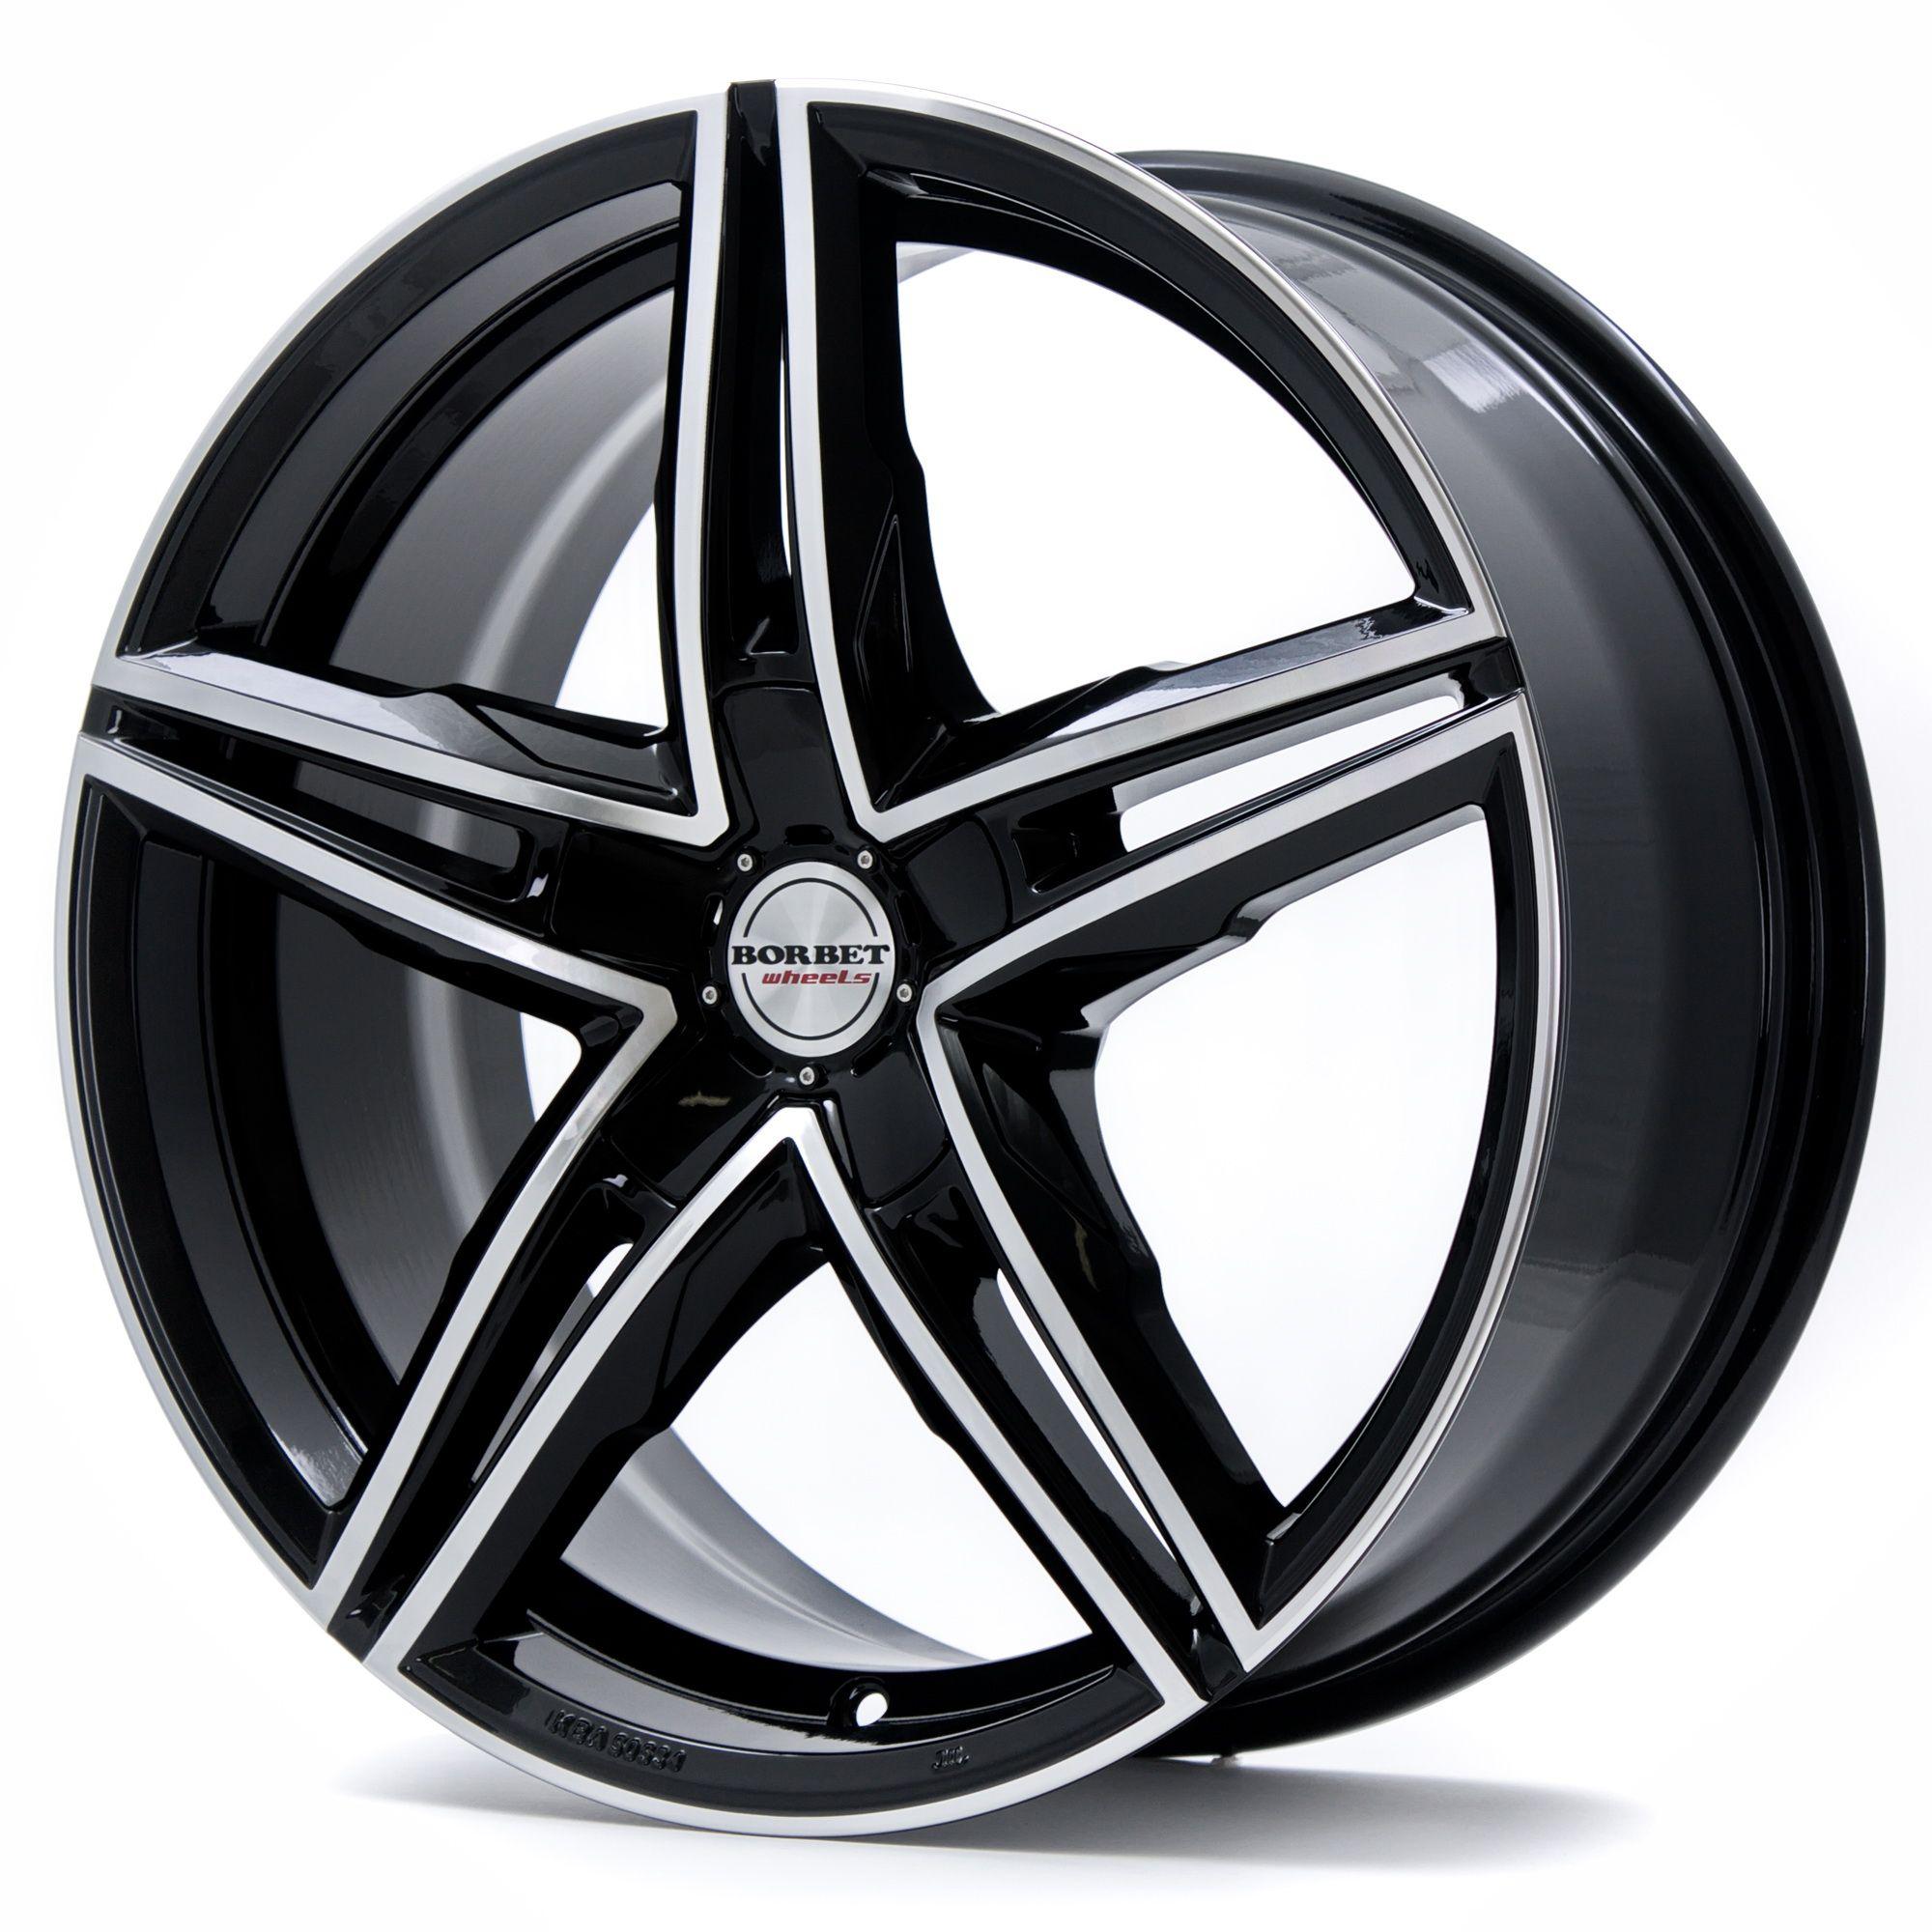 "alu kola BORBET xrs black polished glossy 8x18"" 5x114,3 ET35 72,5"